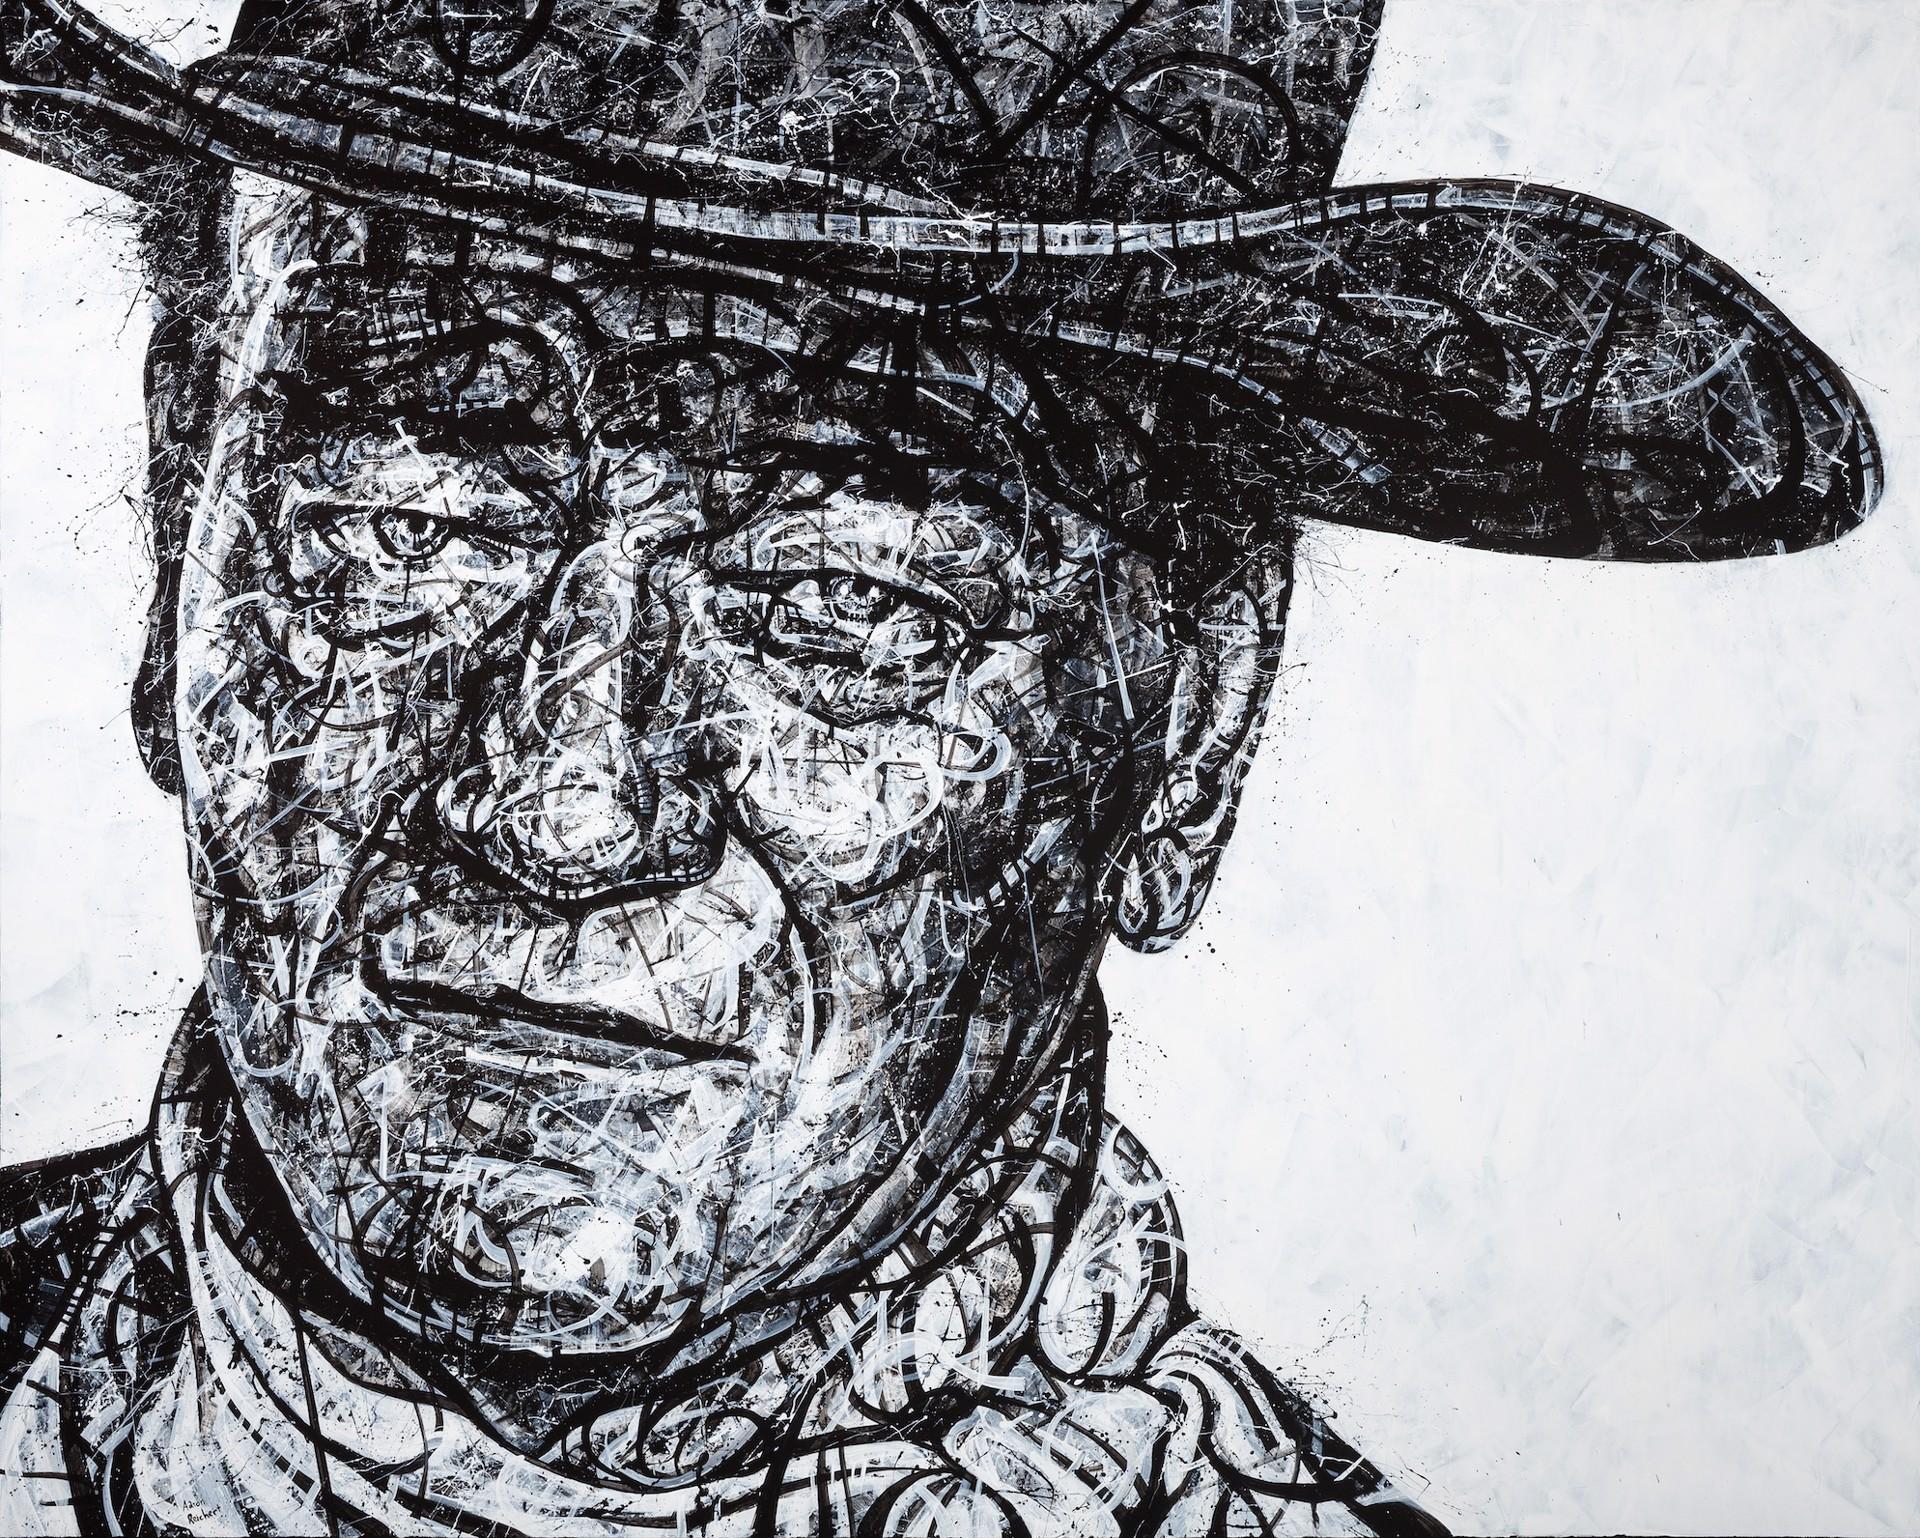 The Hell I Won't, John Wayne by Aaron Reichert